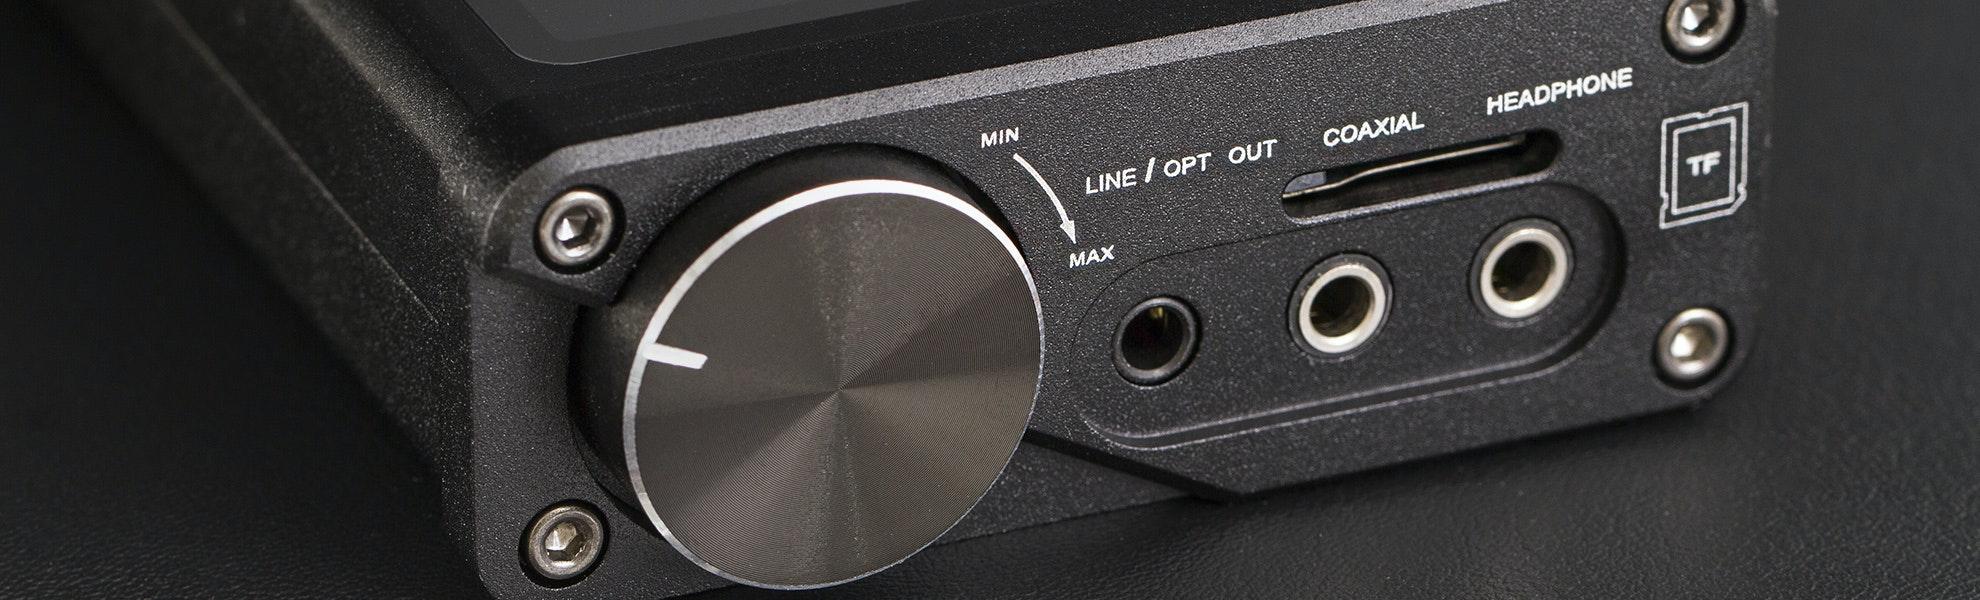 IHIFI960 Dual DAC Audiophile Player